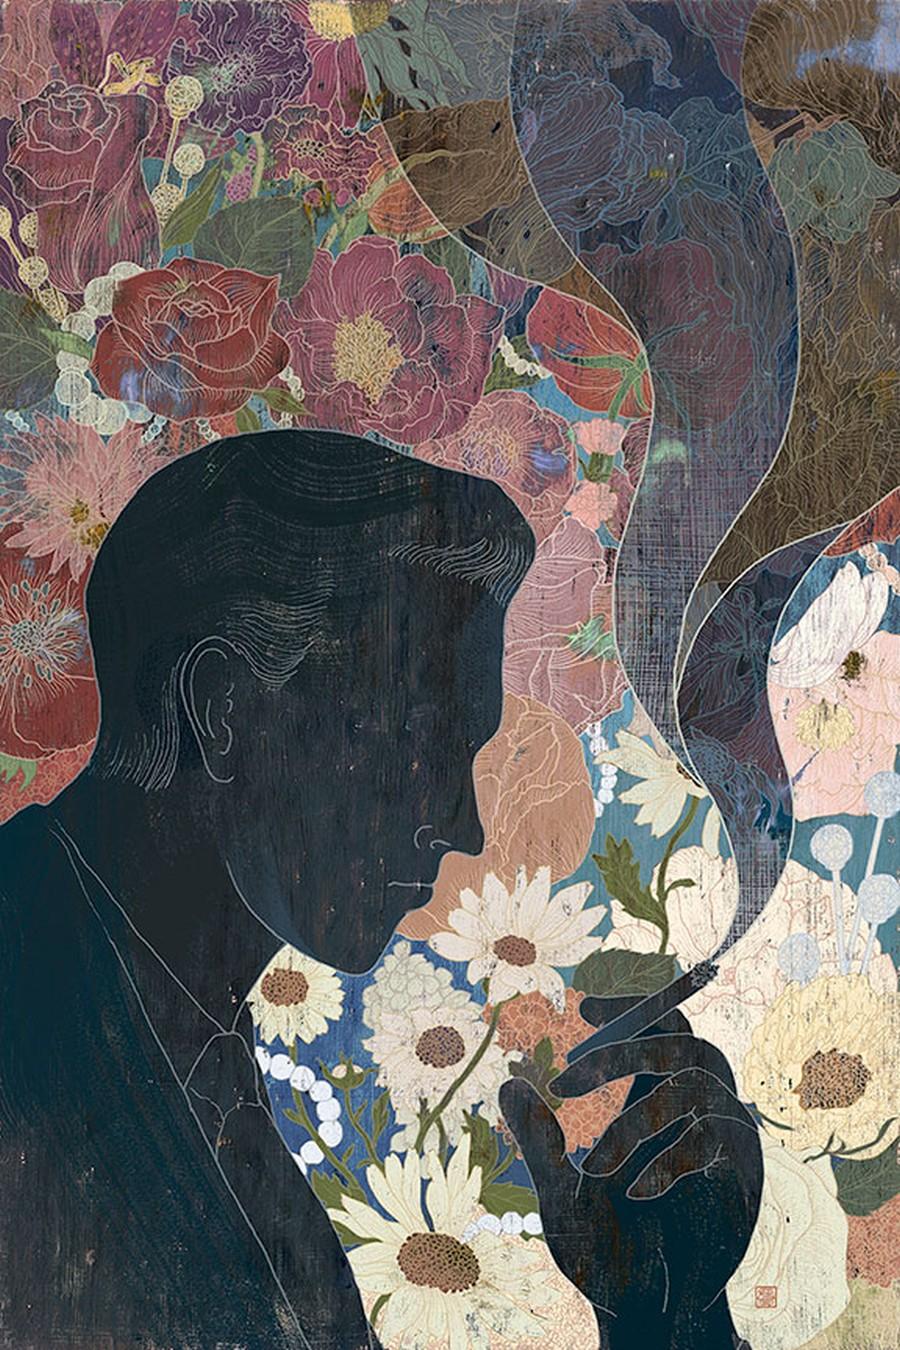 Yohey Horishita-Illustration-Great Gatsby